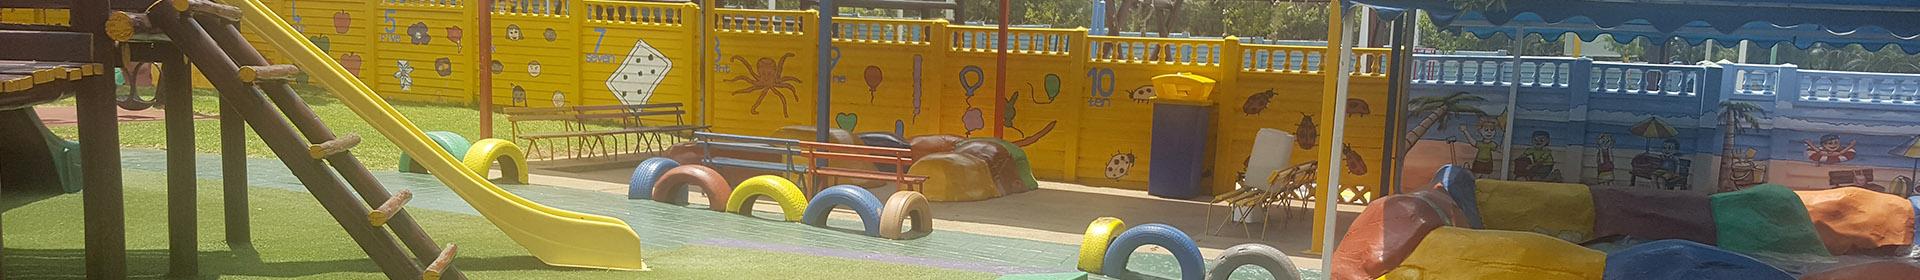 noddy school parent and child corner